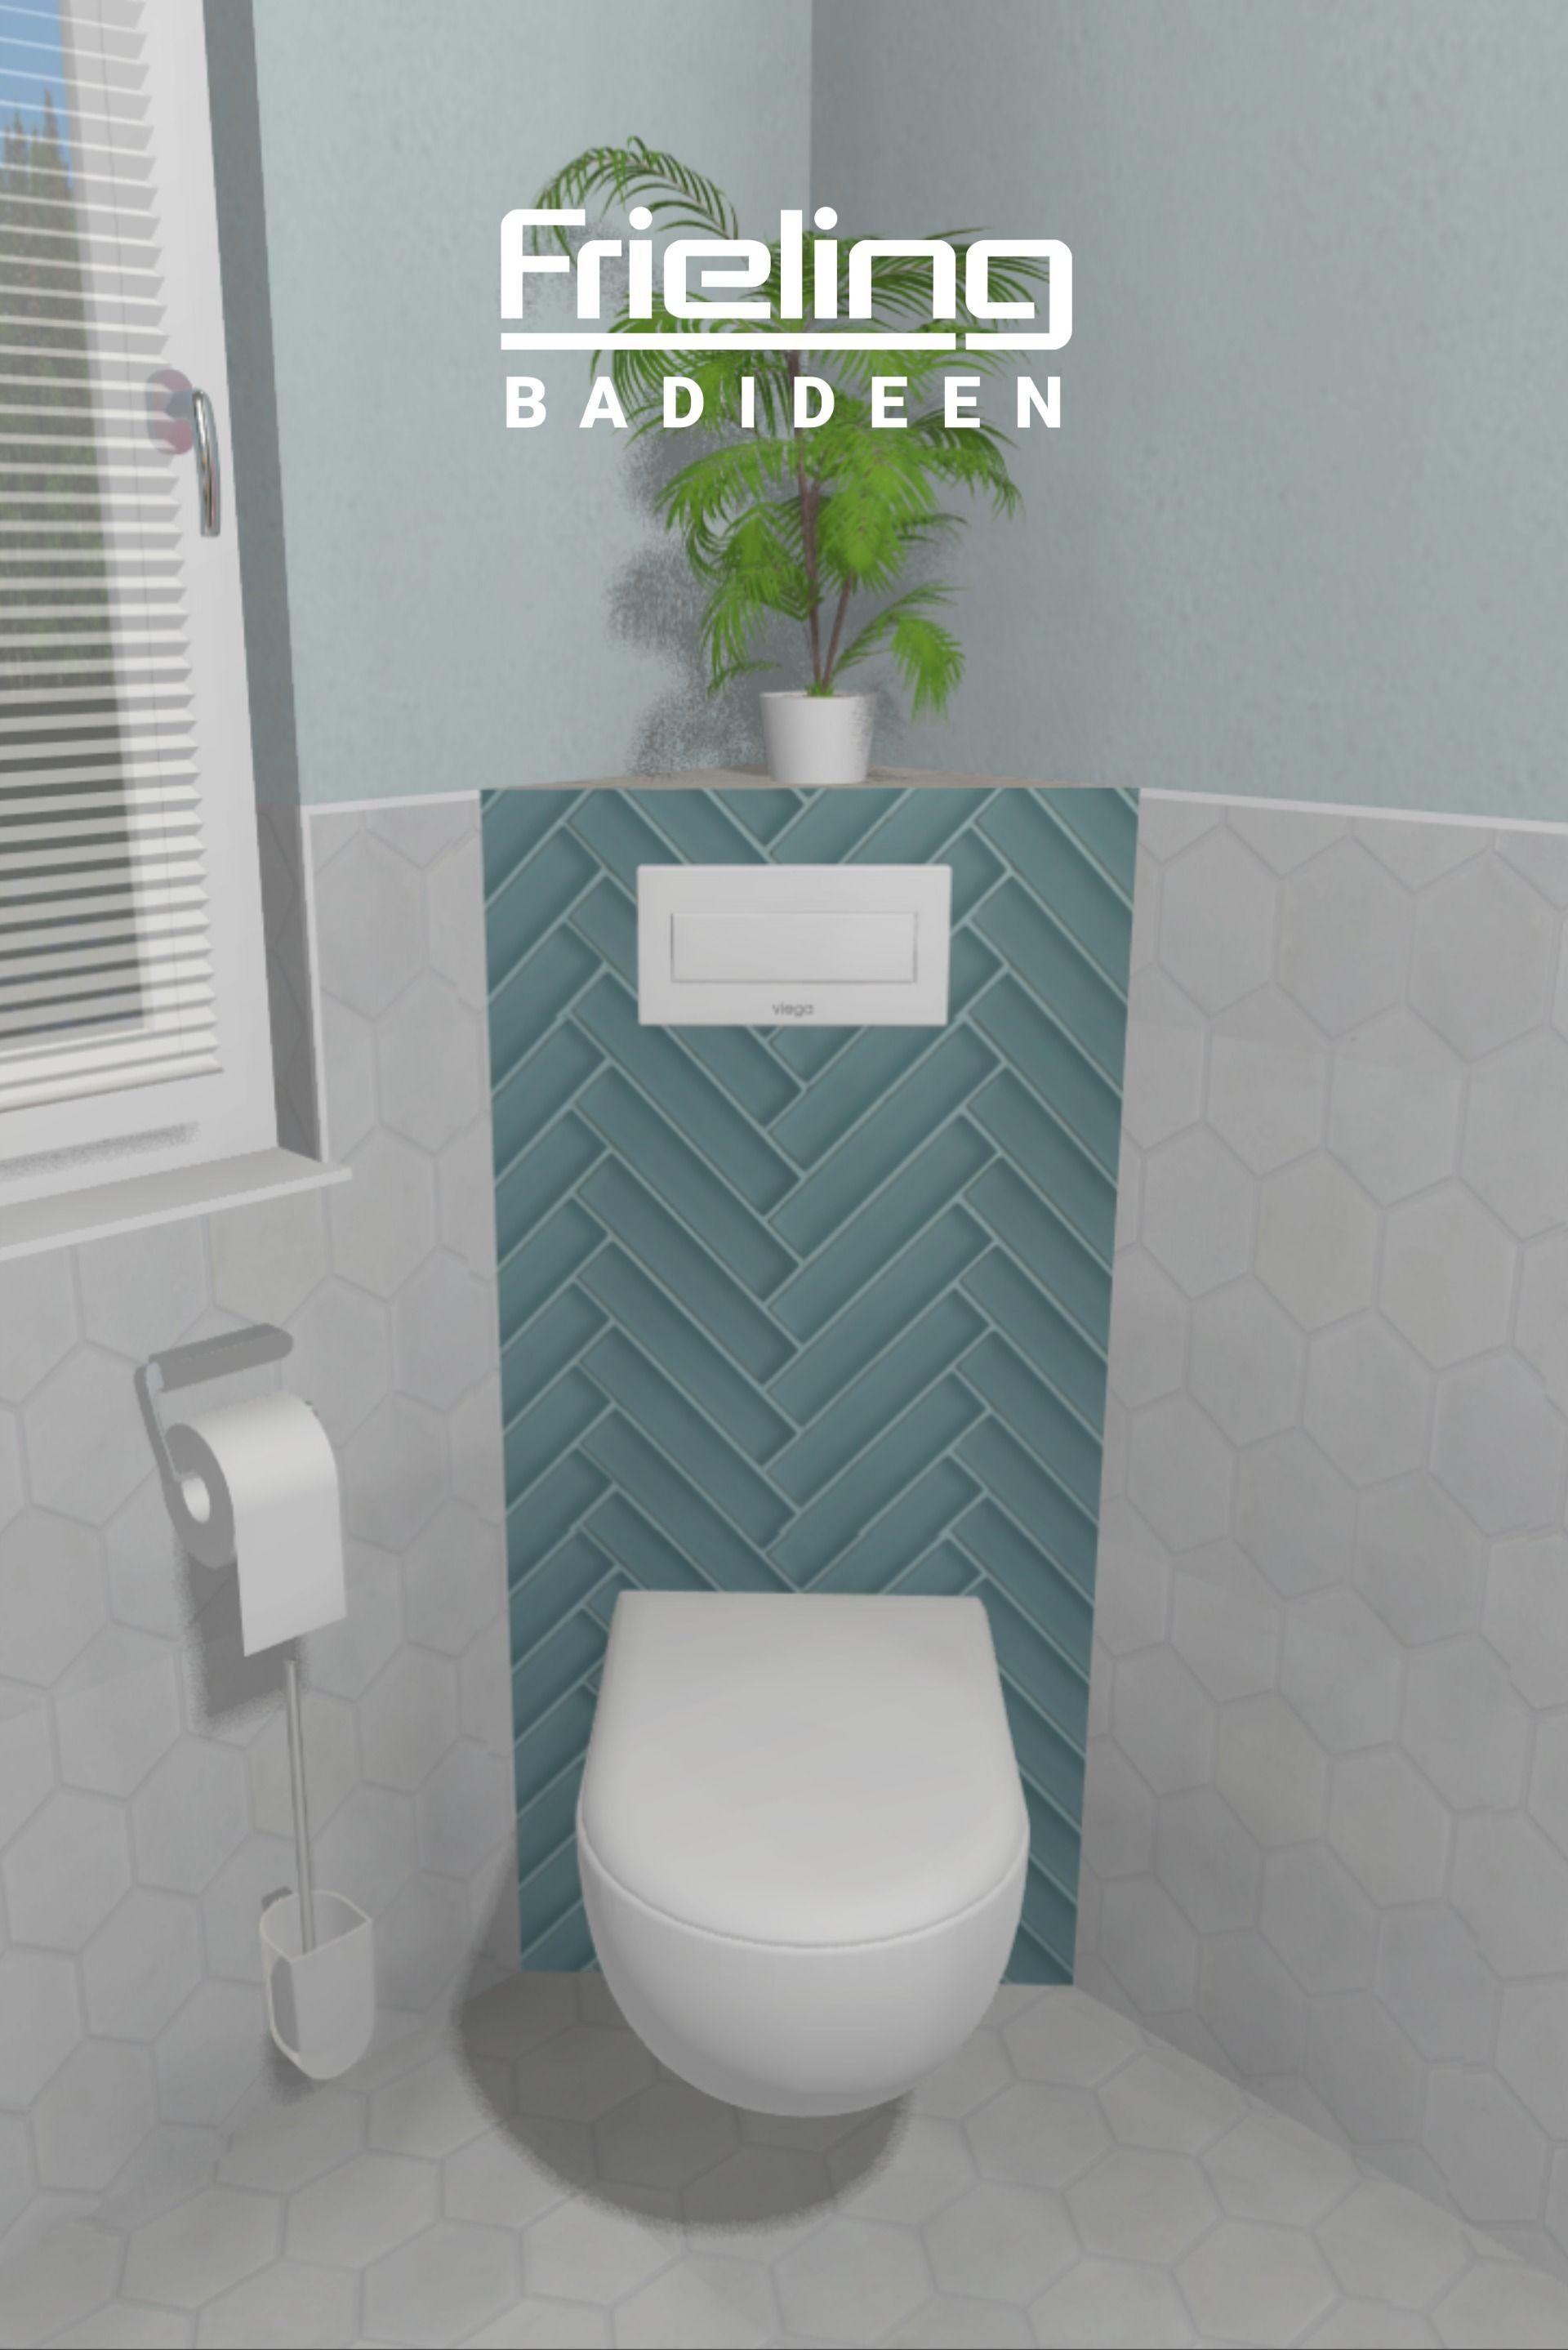 Abgemauertes Wand Wc Fischgratenmuster Skandinavischer Stil 7 Qm Allrounder Badezimmer In 2020 Badezimmer Wand Wc Bader Ideen